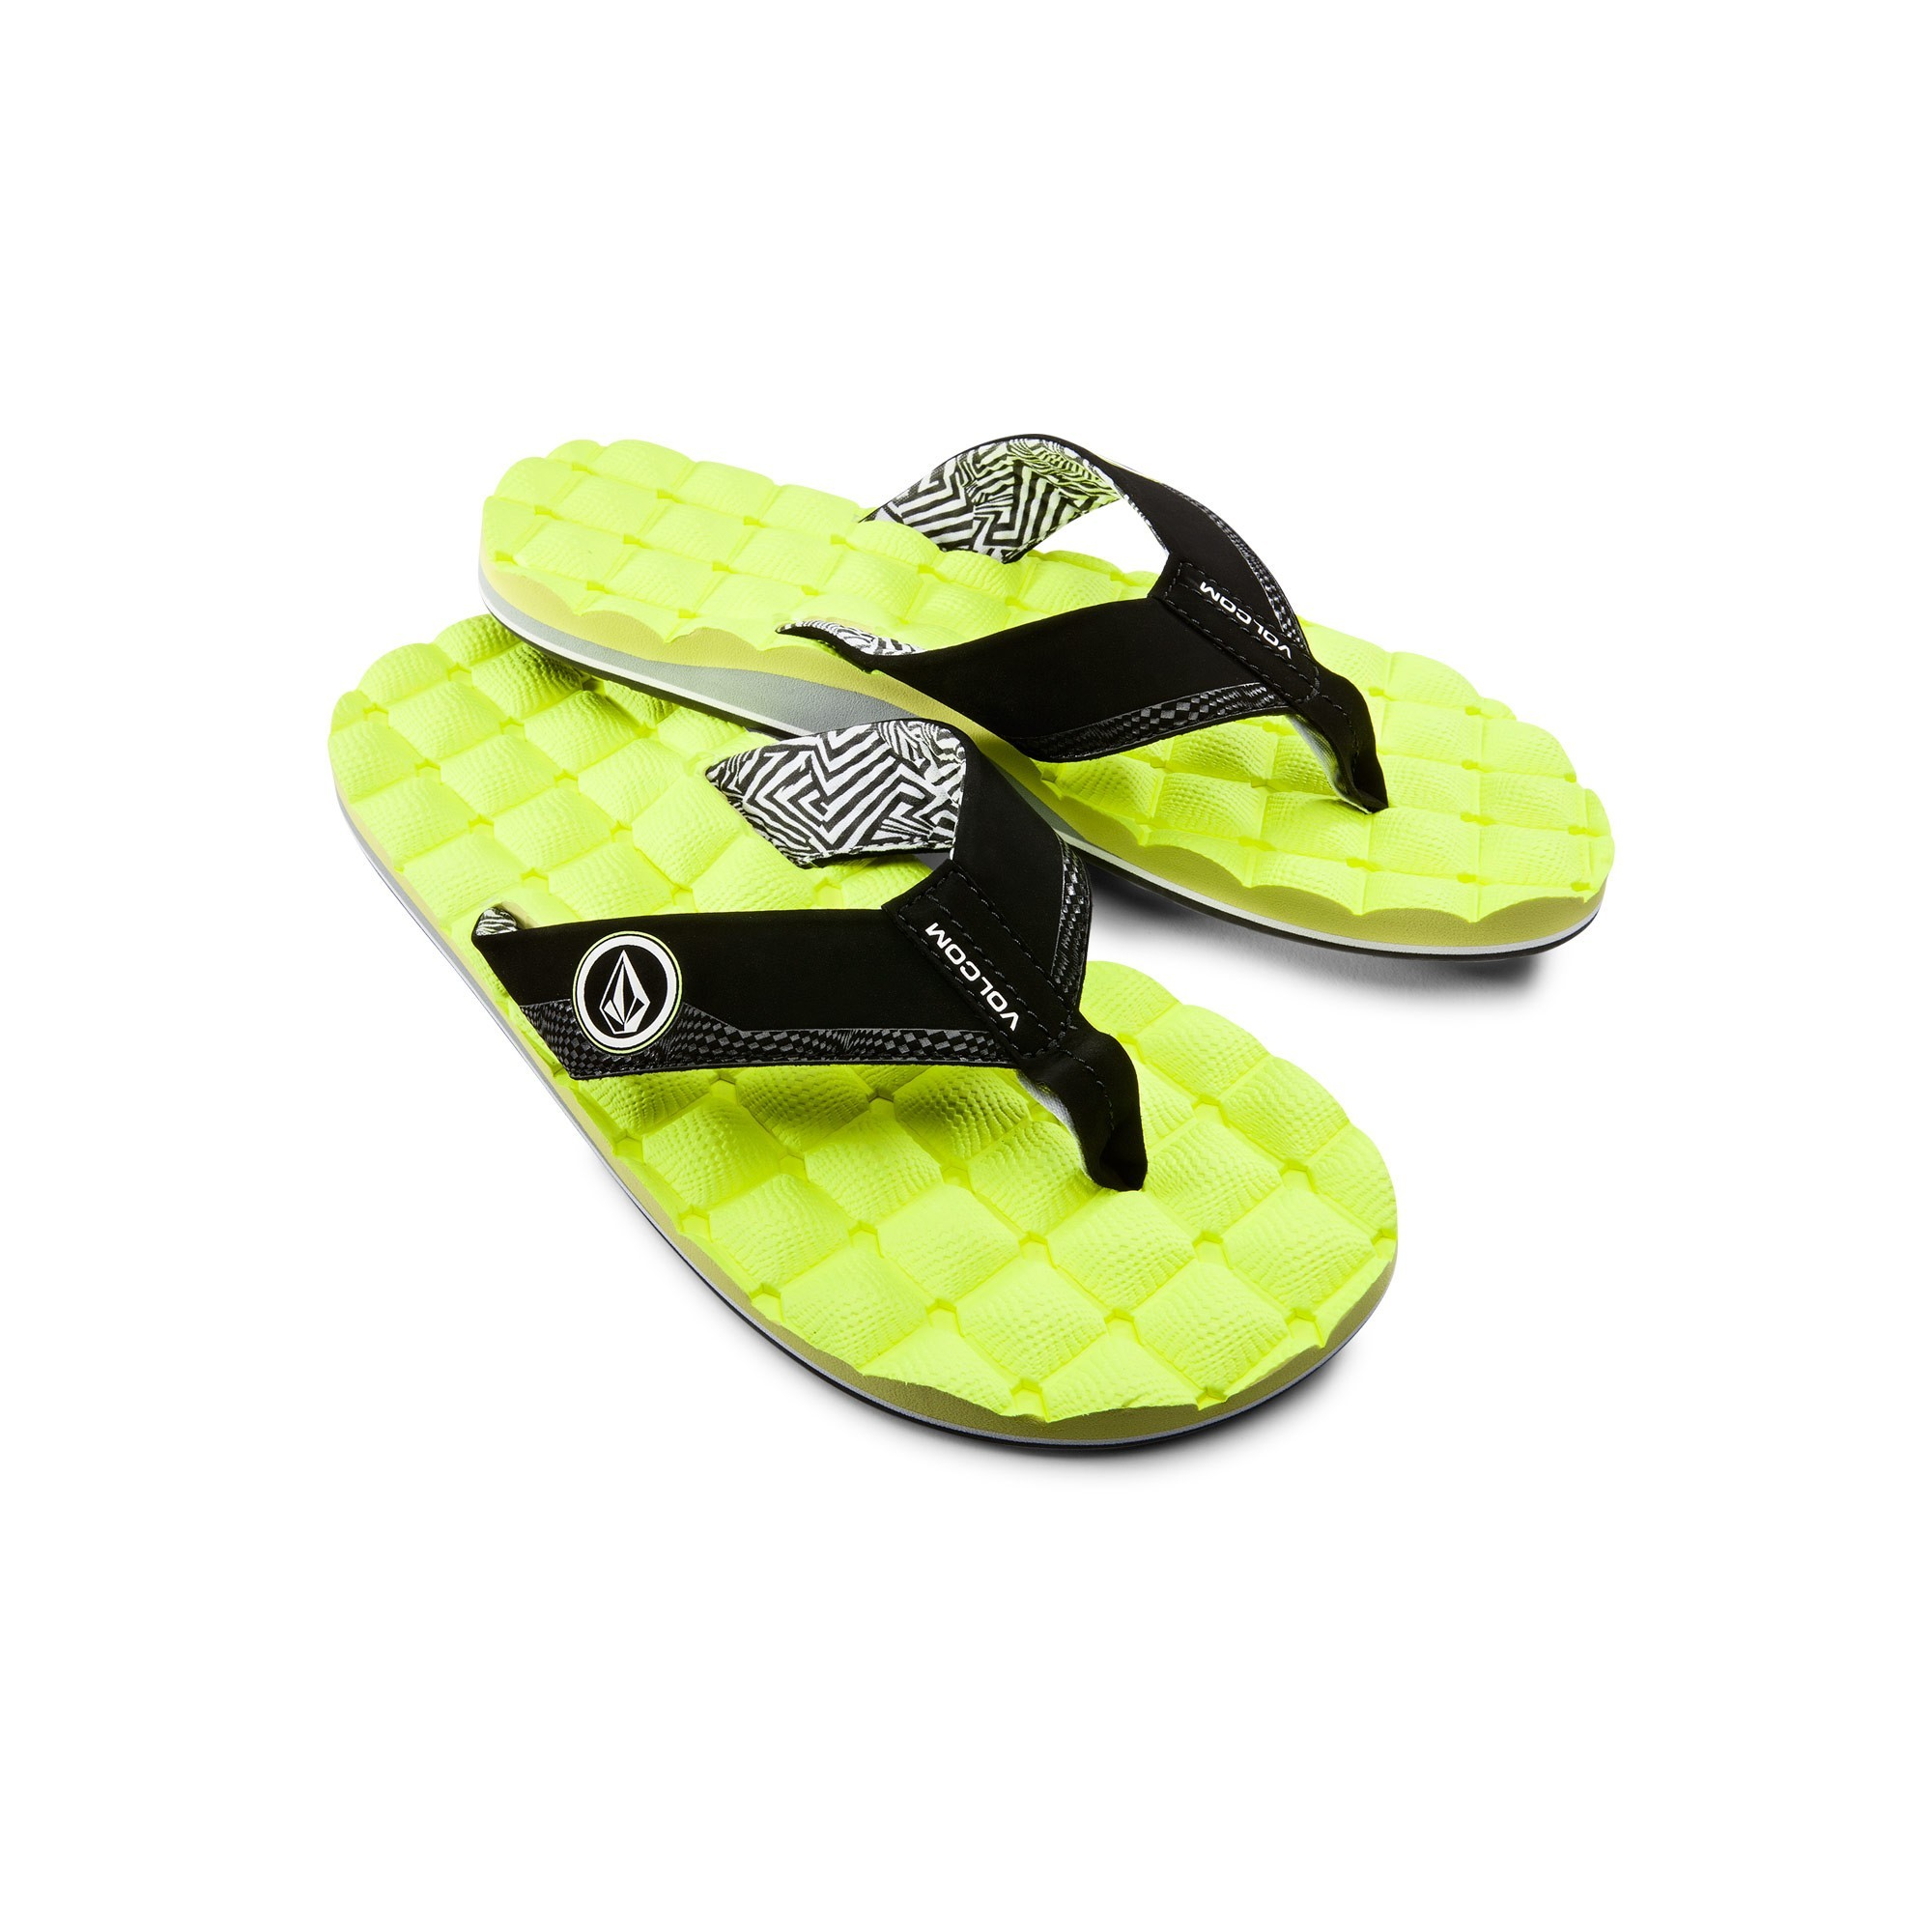 395463a59074 Volcom Men s Recliner Sandal